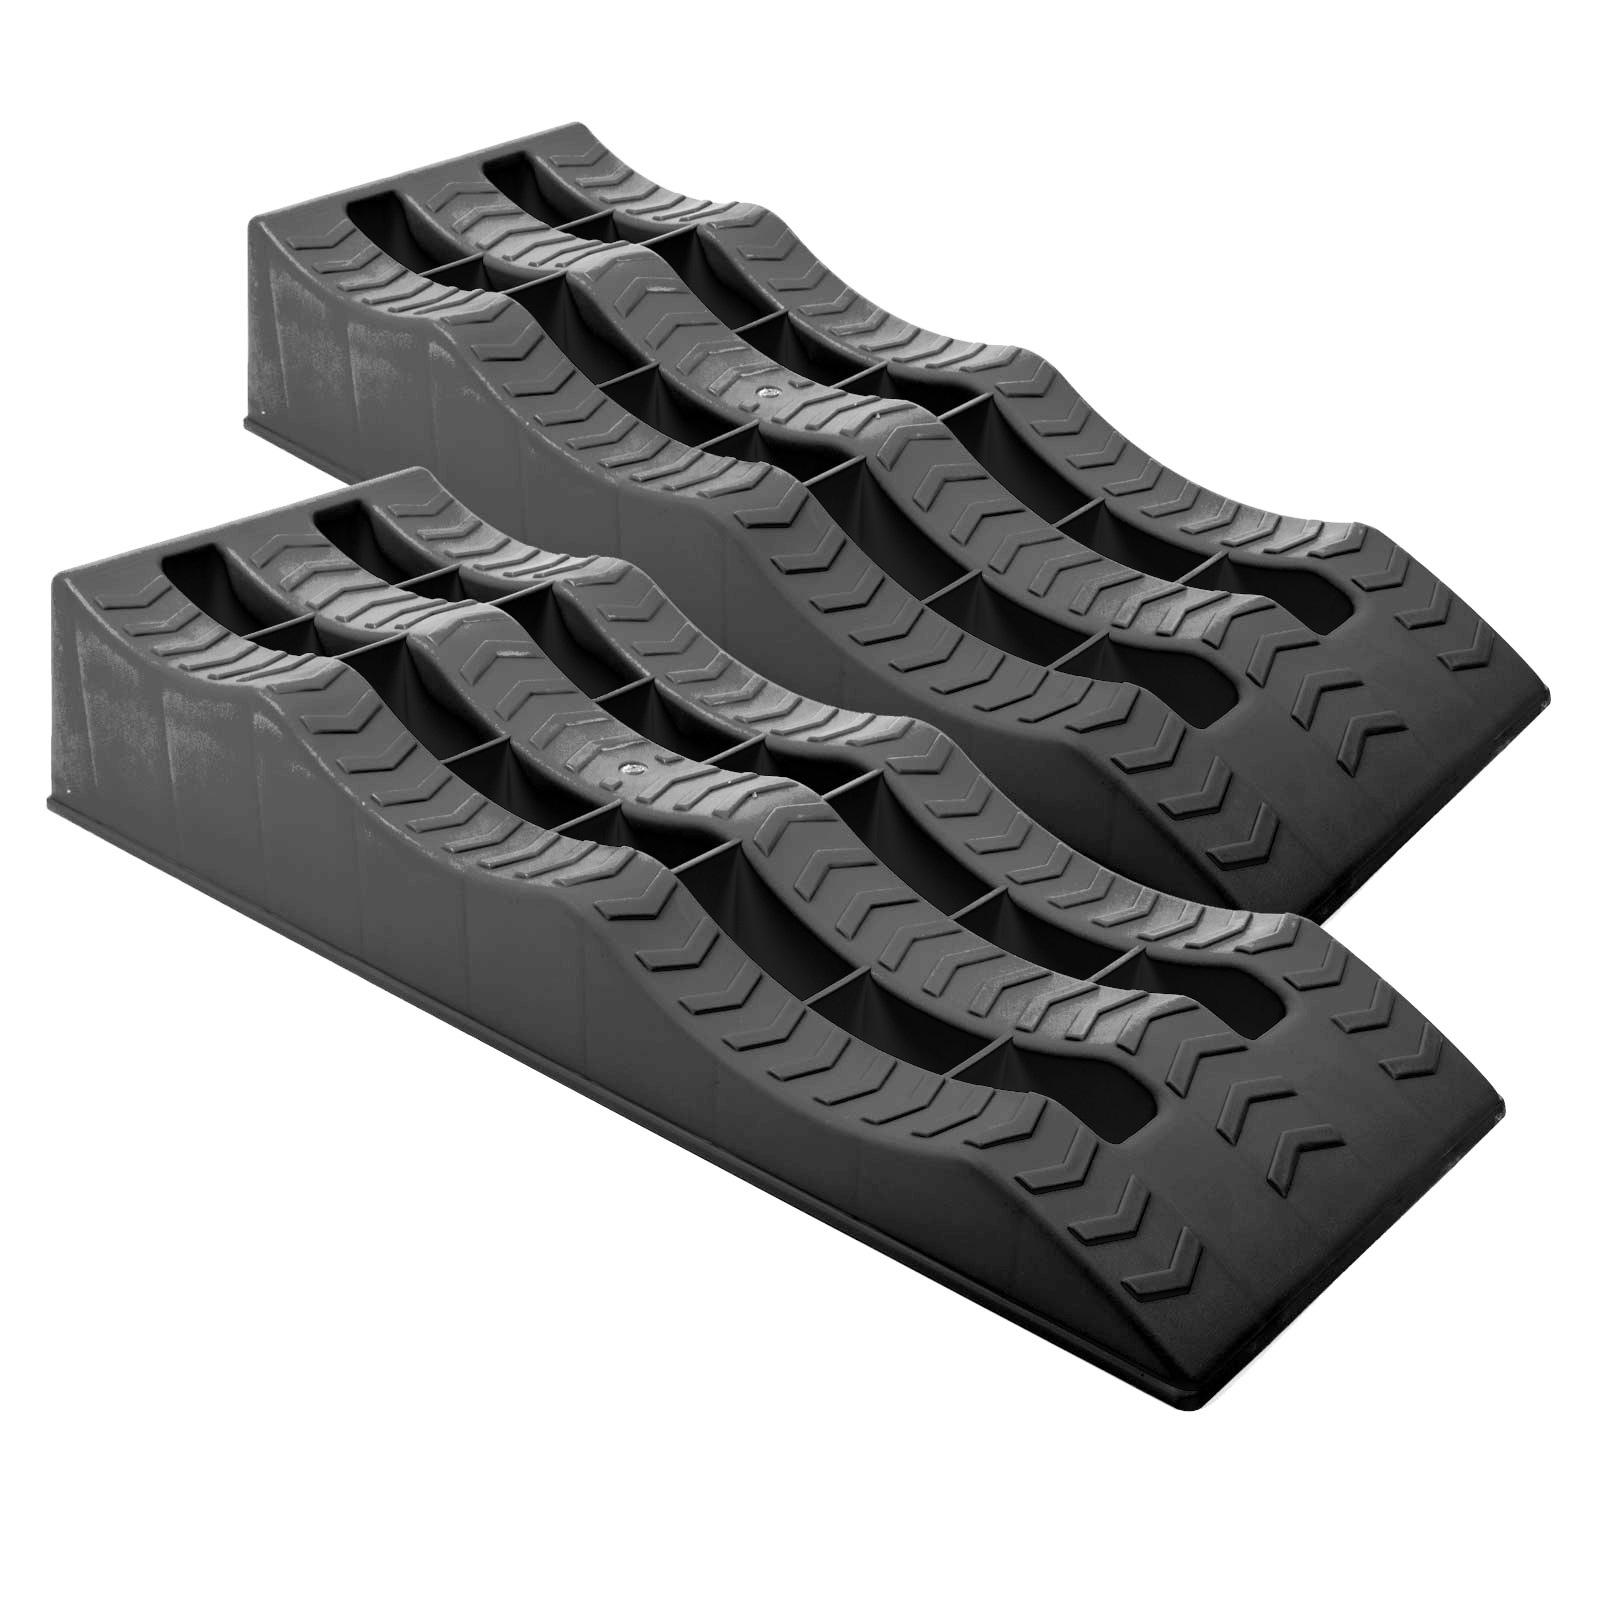 2 x Auffahrkeile Jumbo XL Stufenkeil | pro Achse 5 t | 3 Ebenen | inkl. Tasche